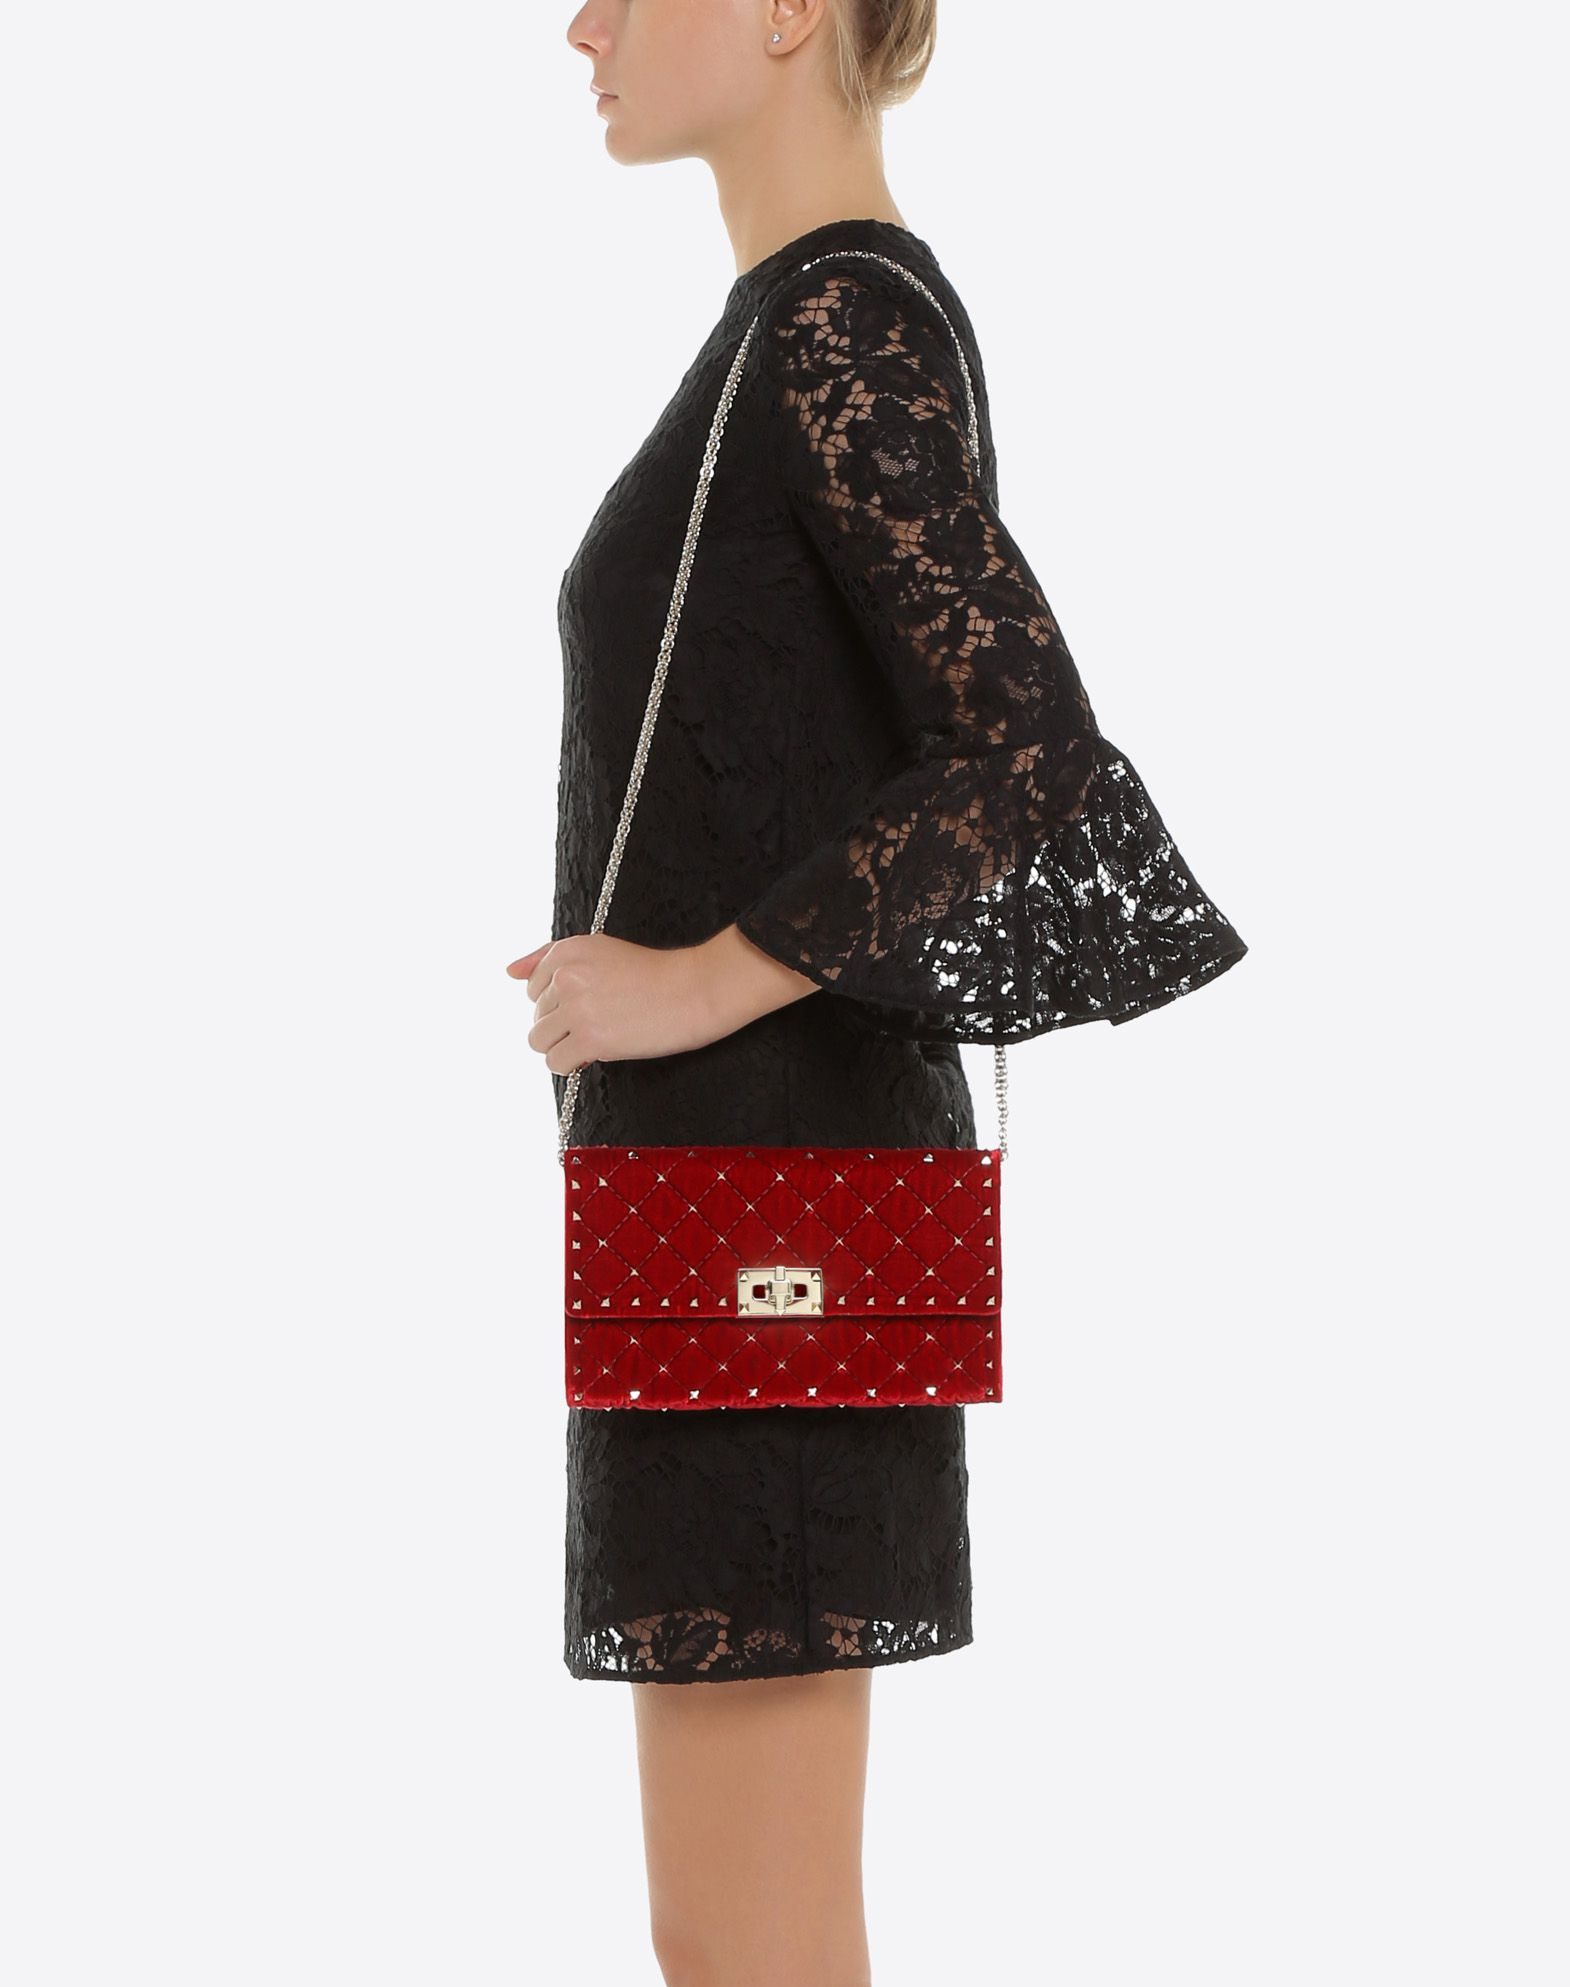 VALENTINO GARAVANI Rockstud Spike Chain Bag CROSS BODY BAG D a